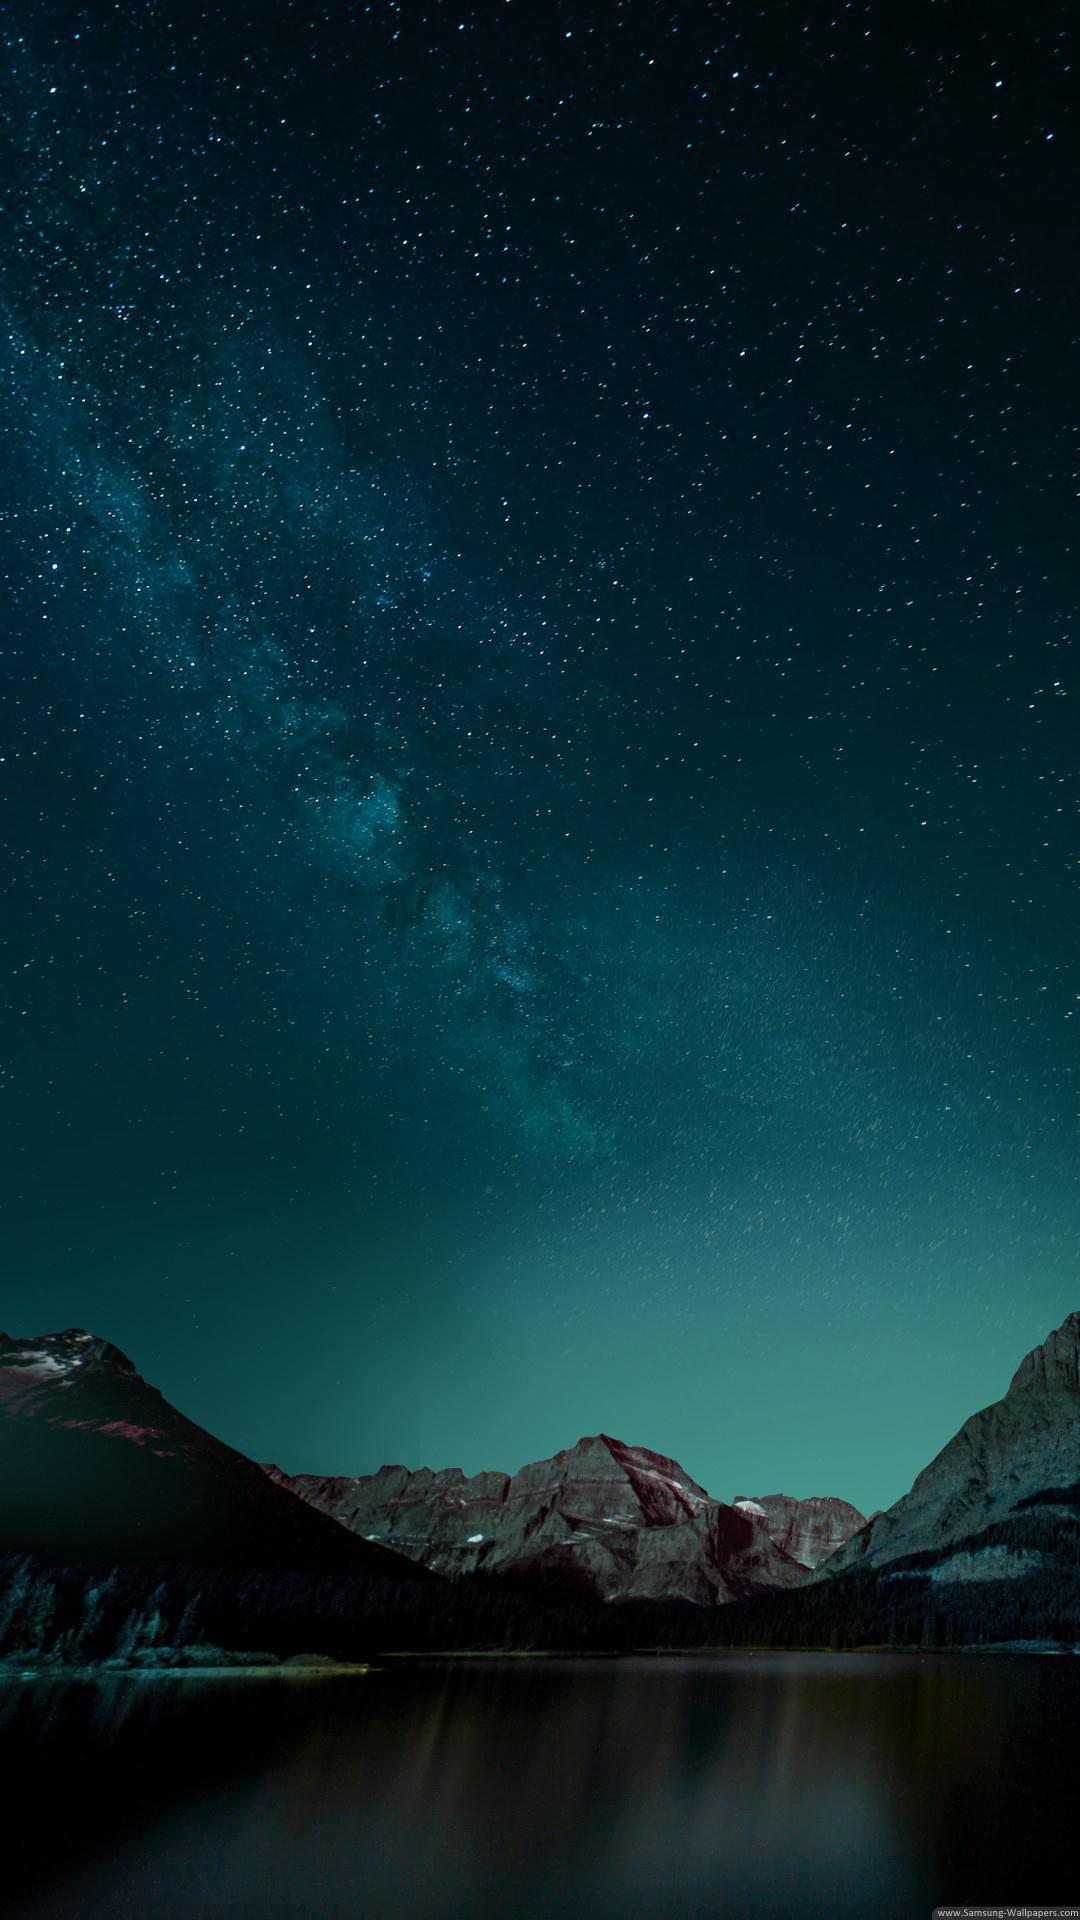 Amazing Wallpaper Night Galaxy - 370263  Trends-72162.jpg